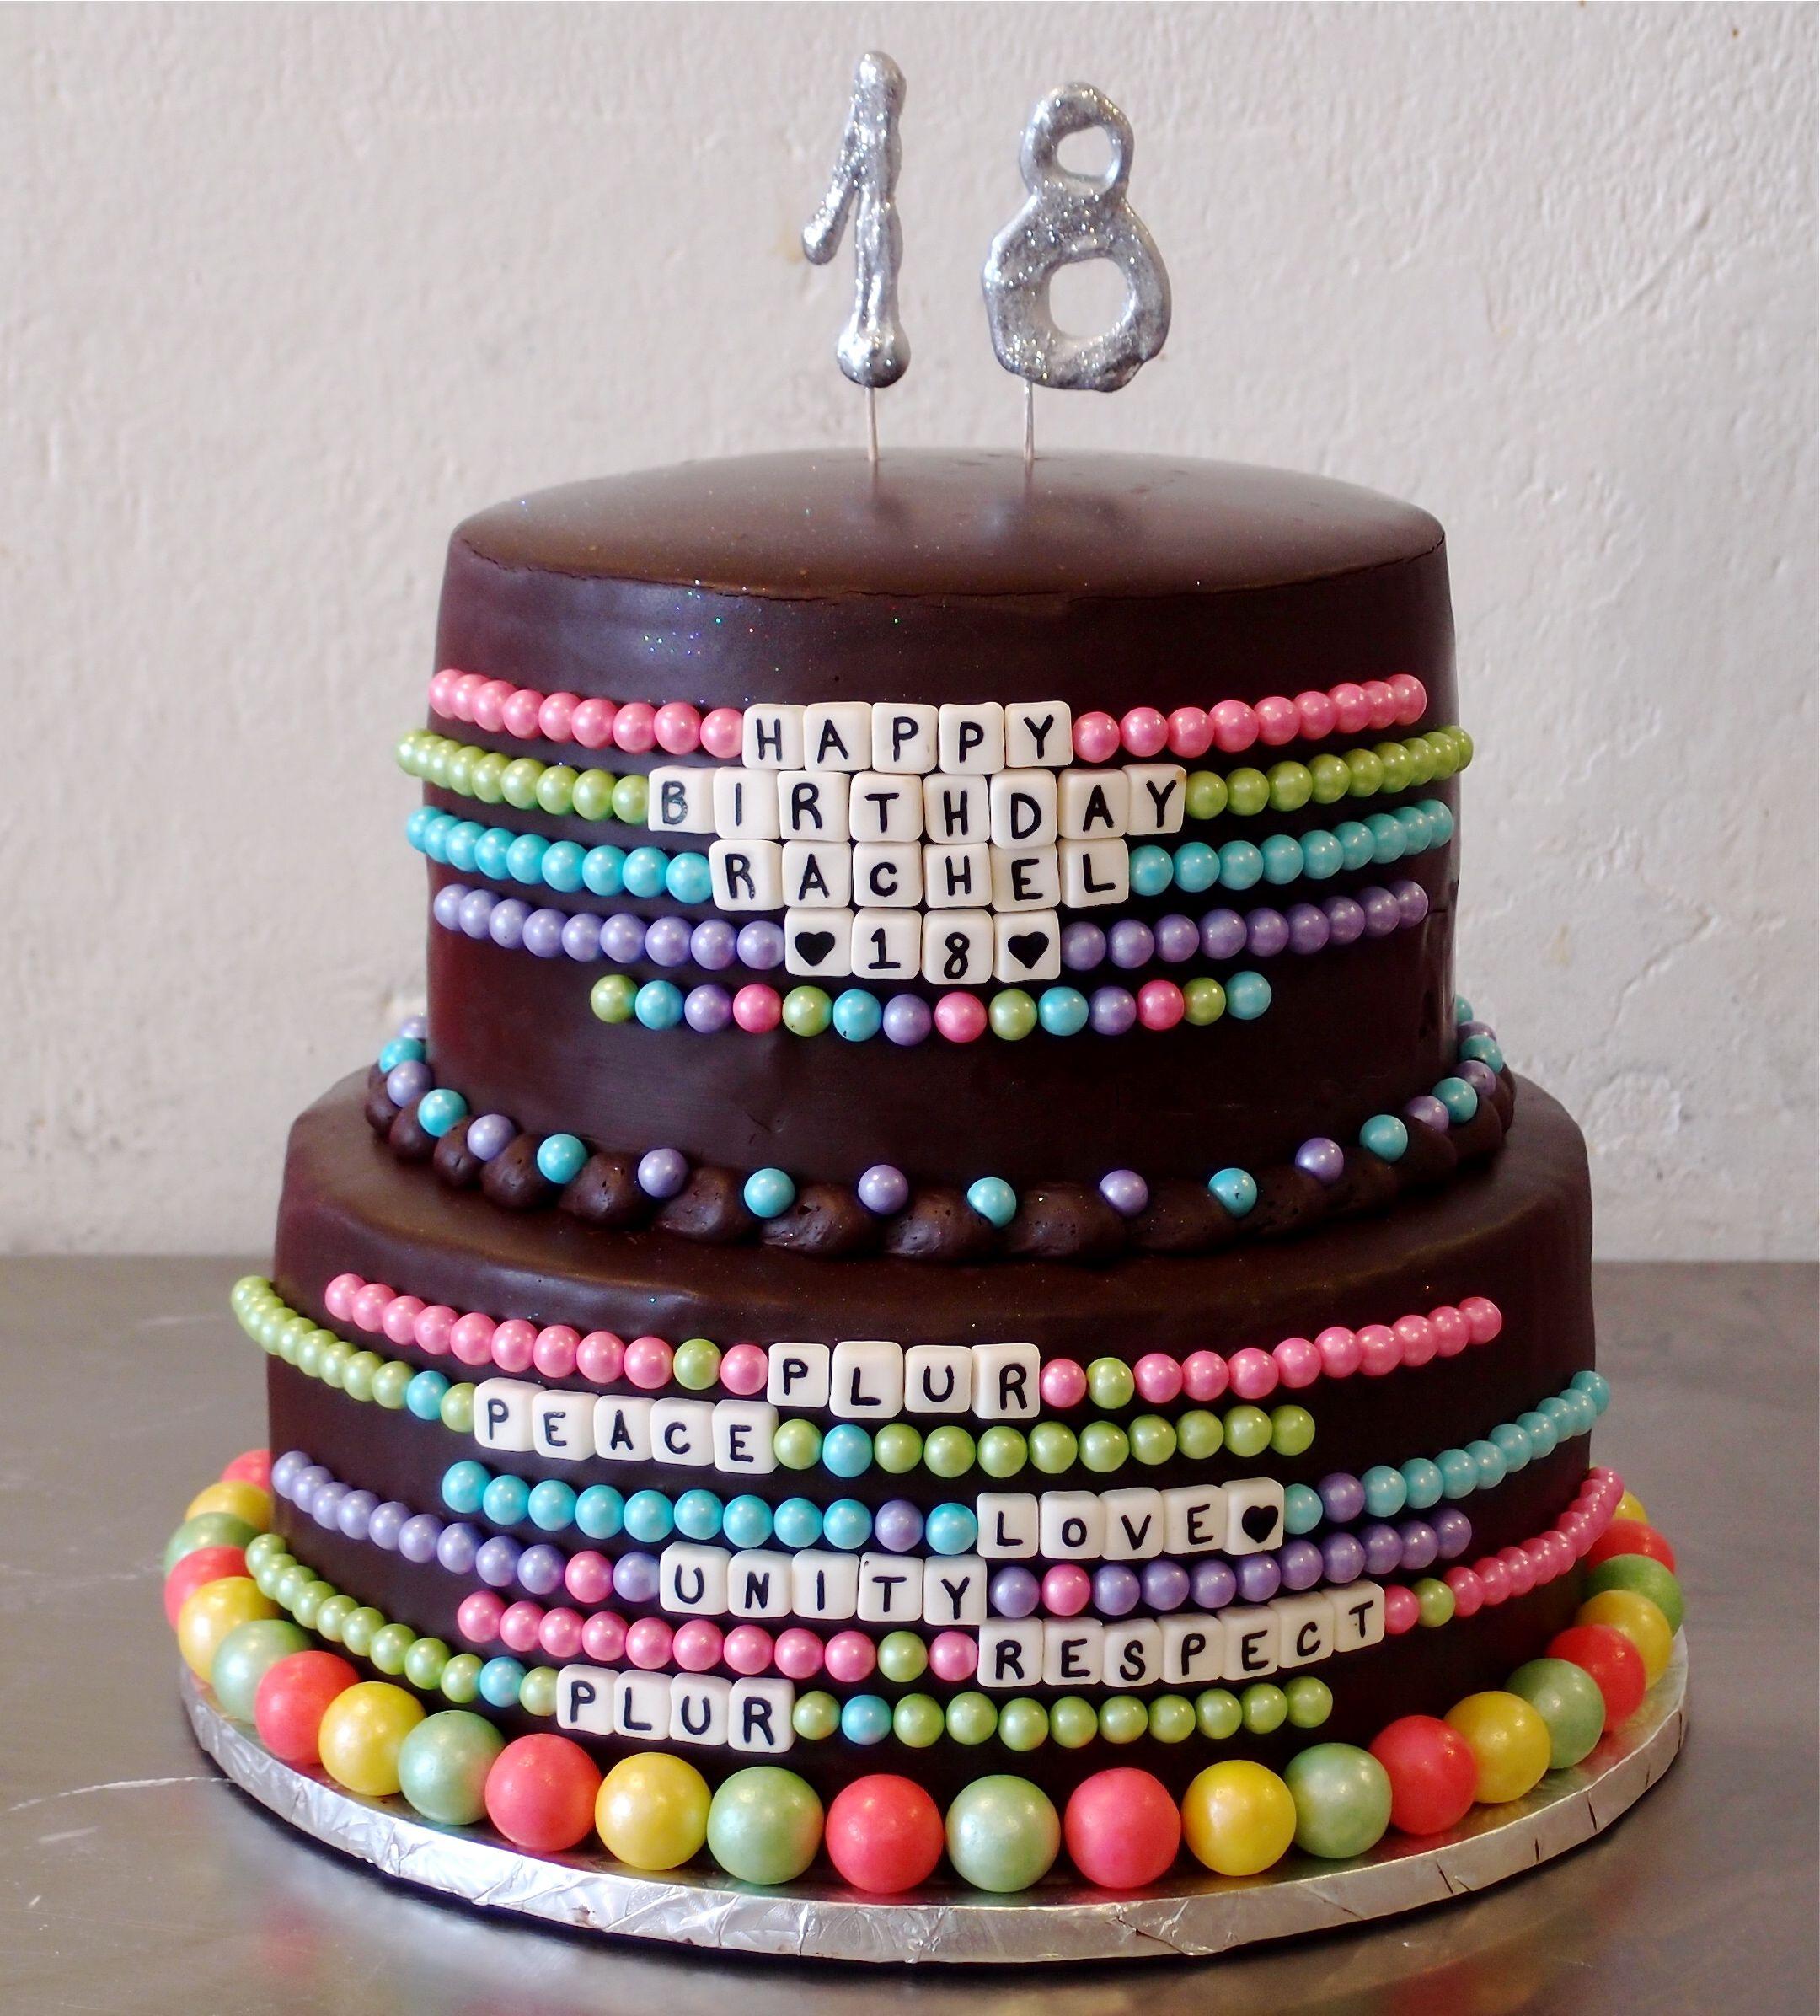 Rachel's Awesome 18th Birthday Bracelet Cake From Splurge